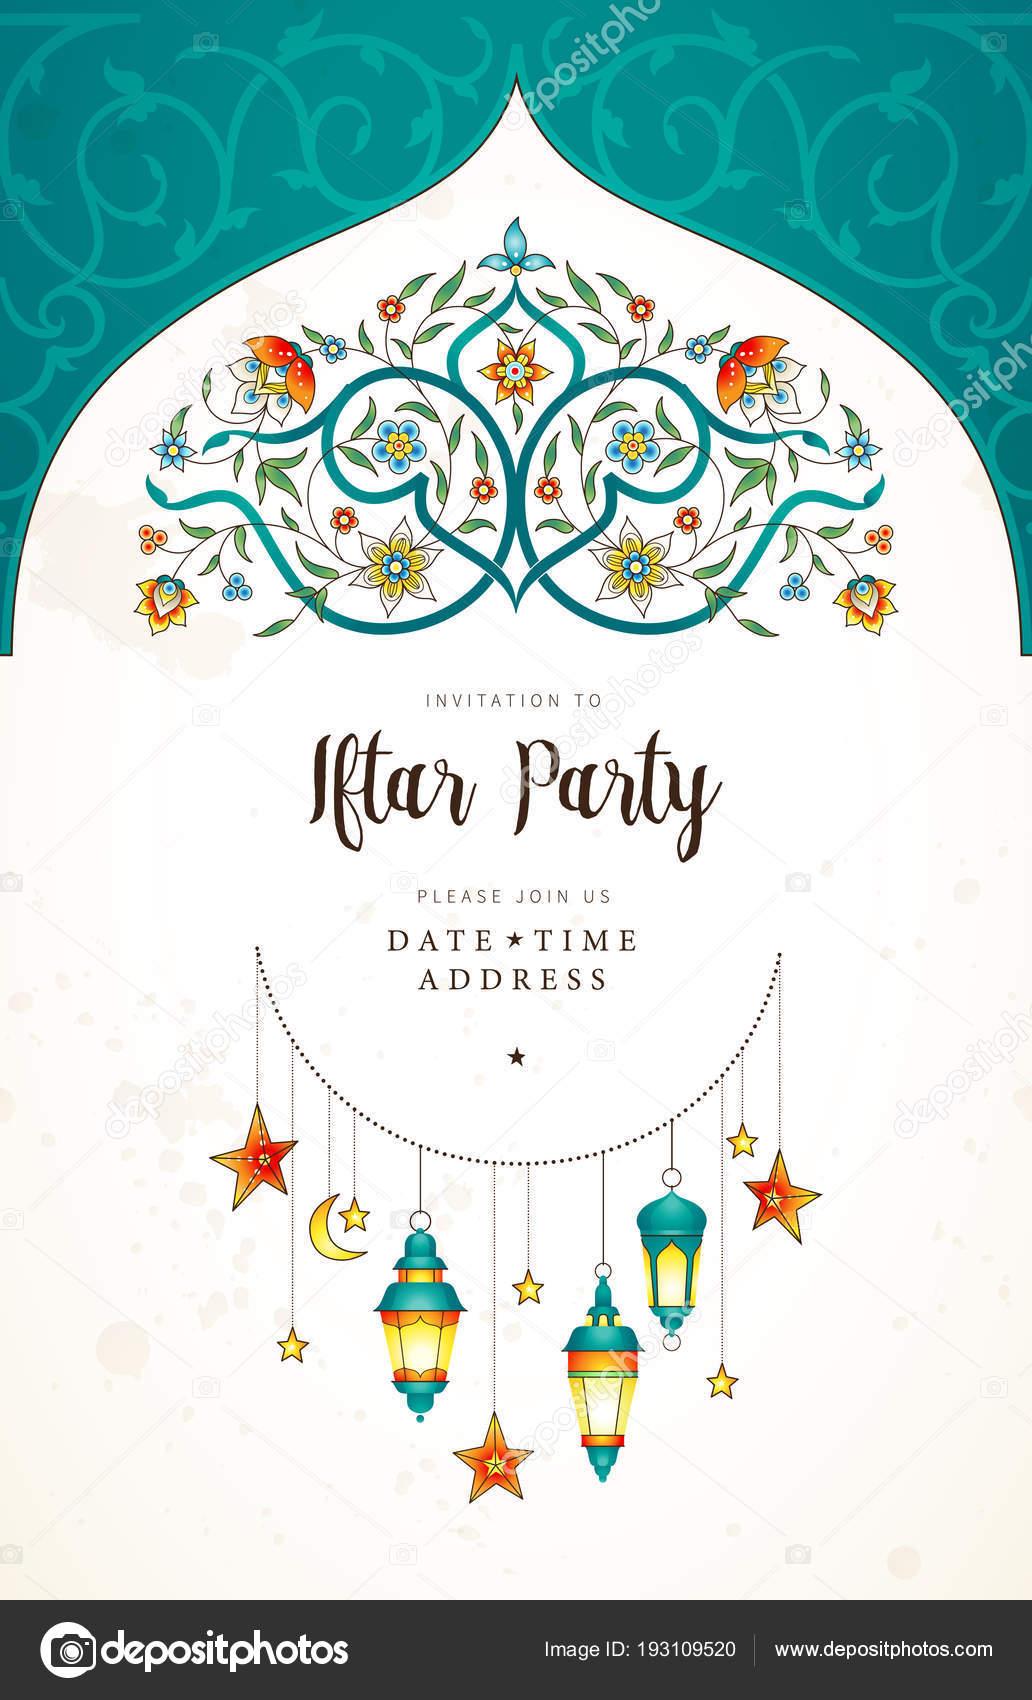 Ramadan kareem card invitation to iftar party celebration stock ramadan kareem card invitation to iftar party celebration stock vector stopboris Gallery